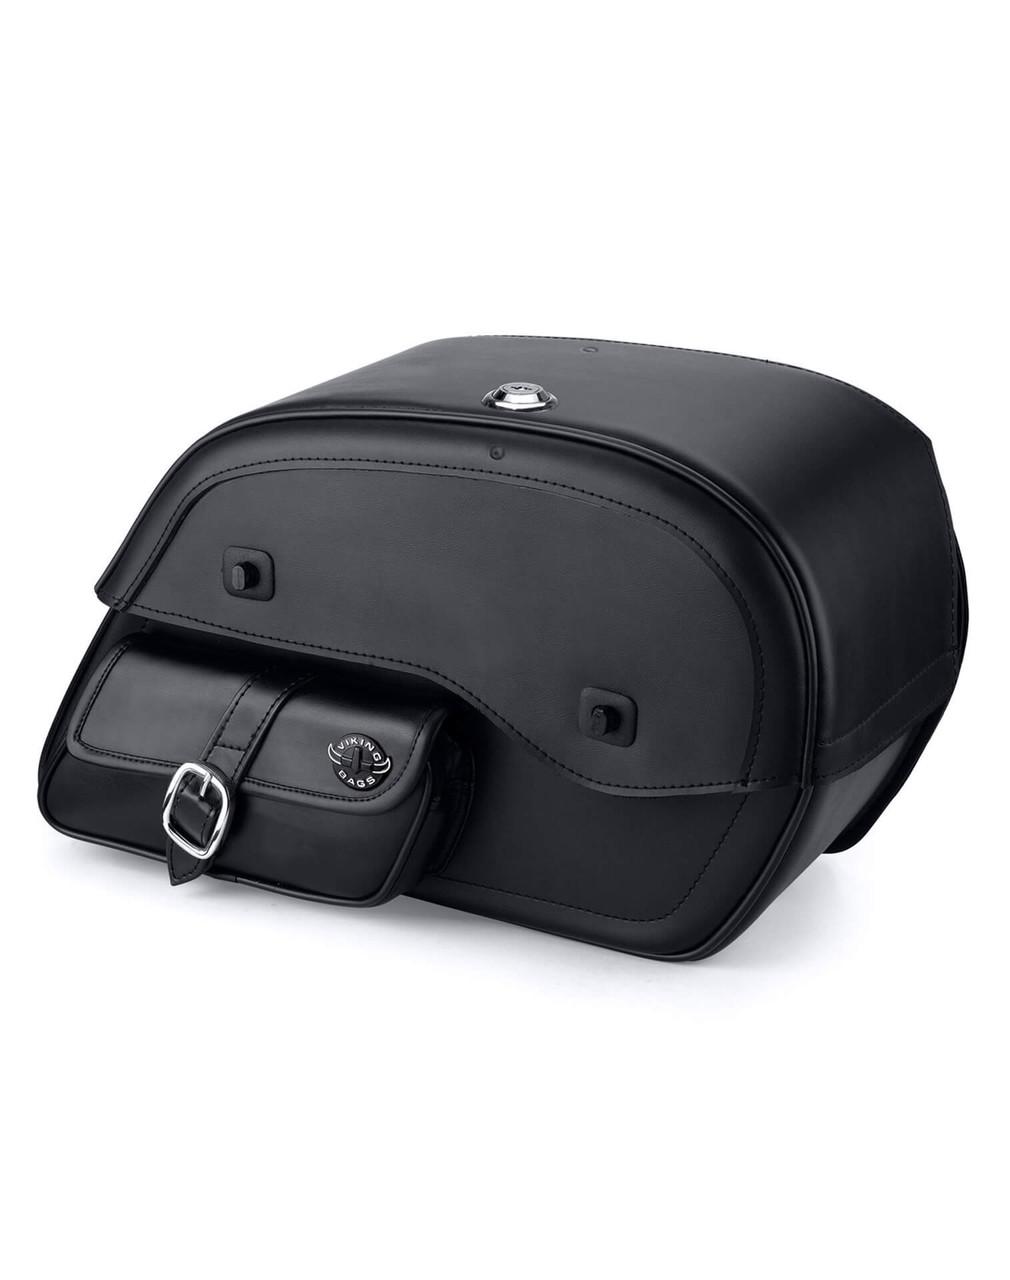 Honda 1100 Shadow Spirit Side Pocket Motorcycle Saddlebags Main Bag View